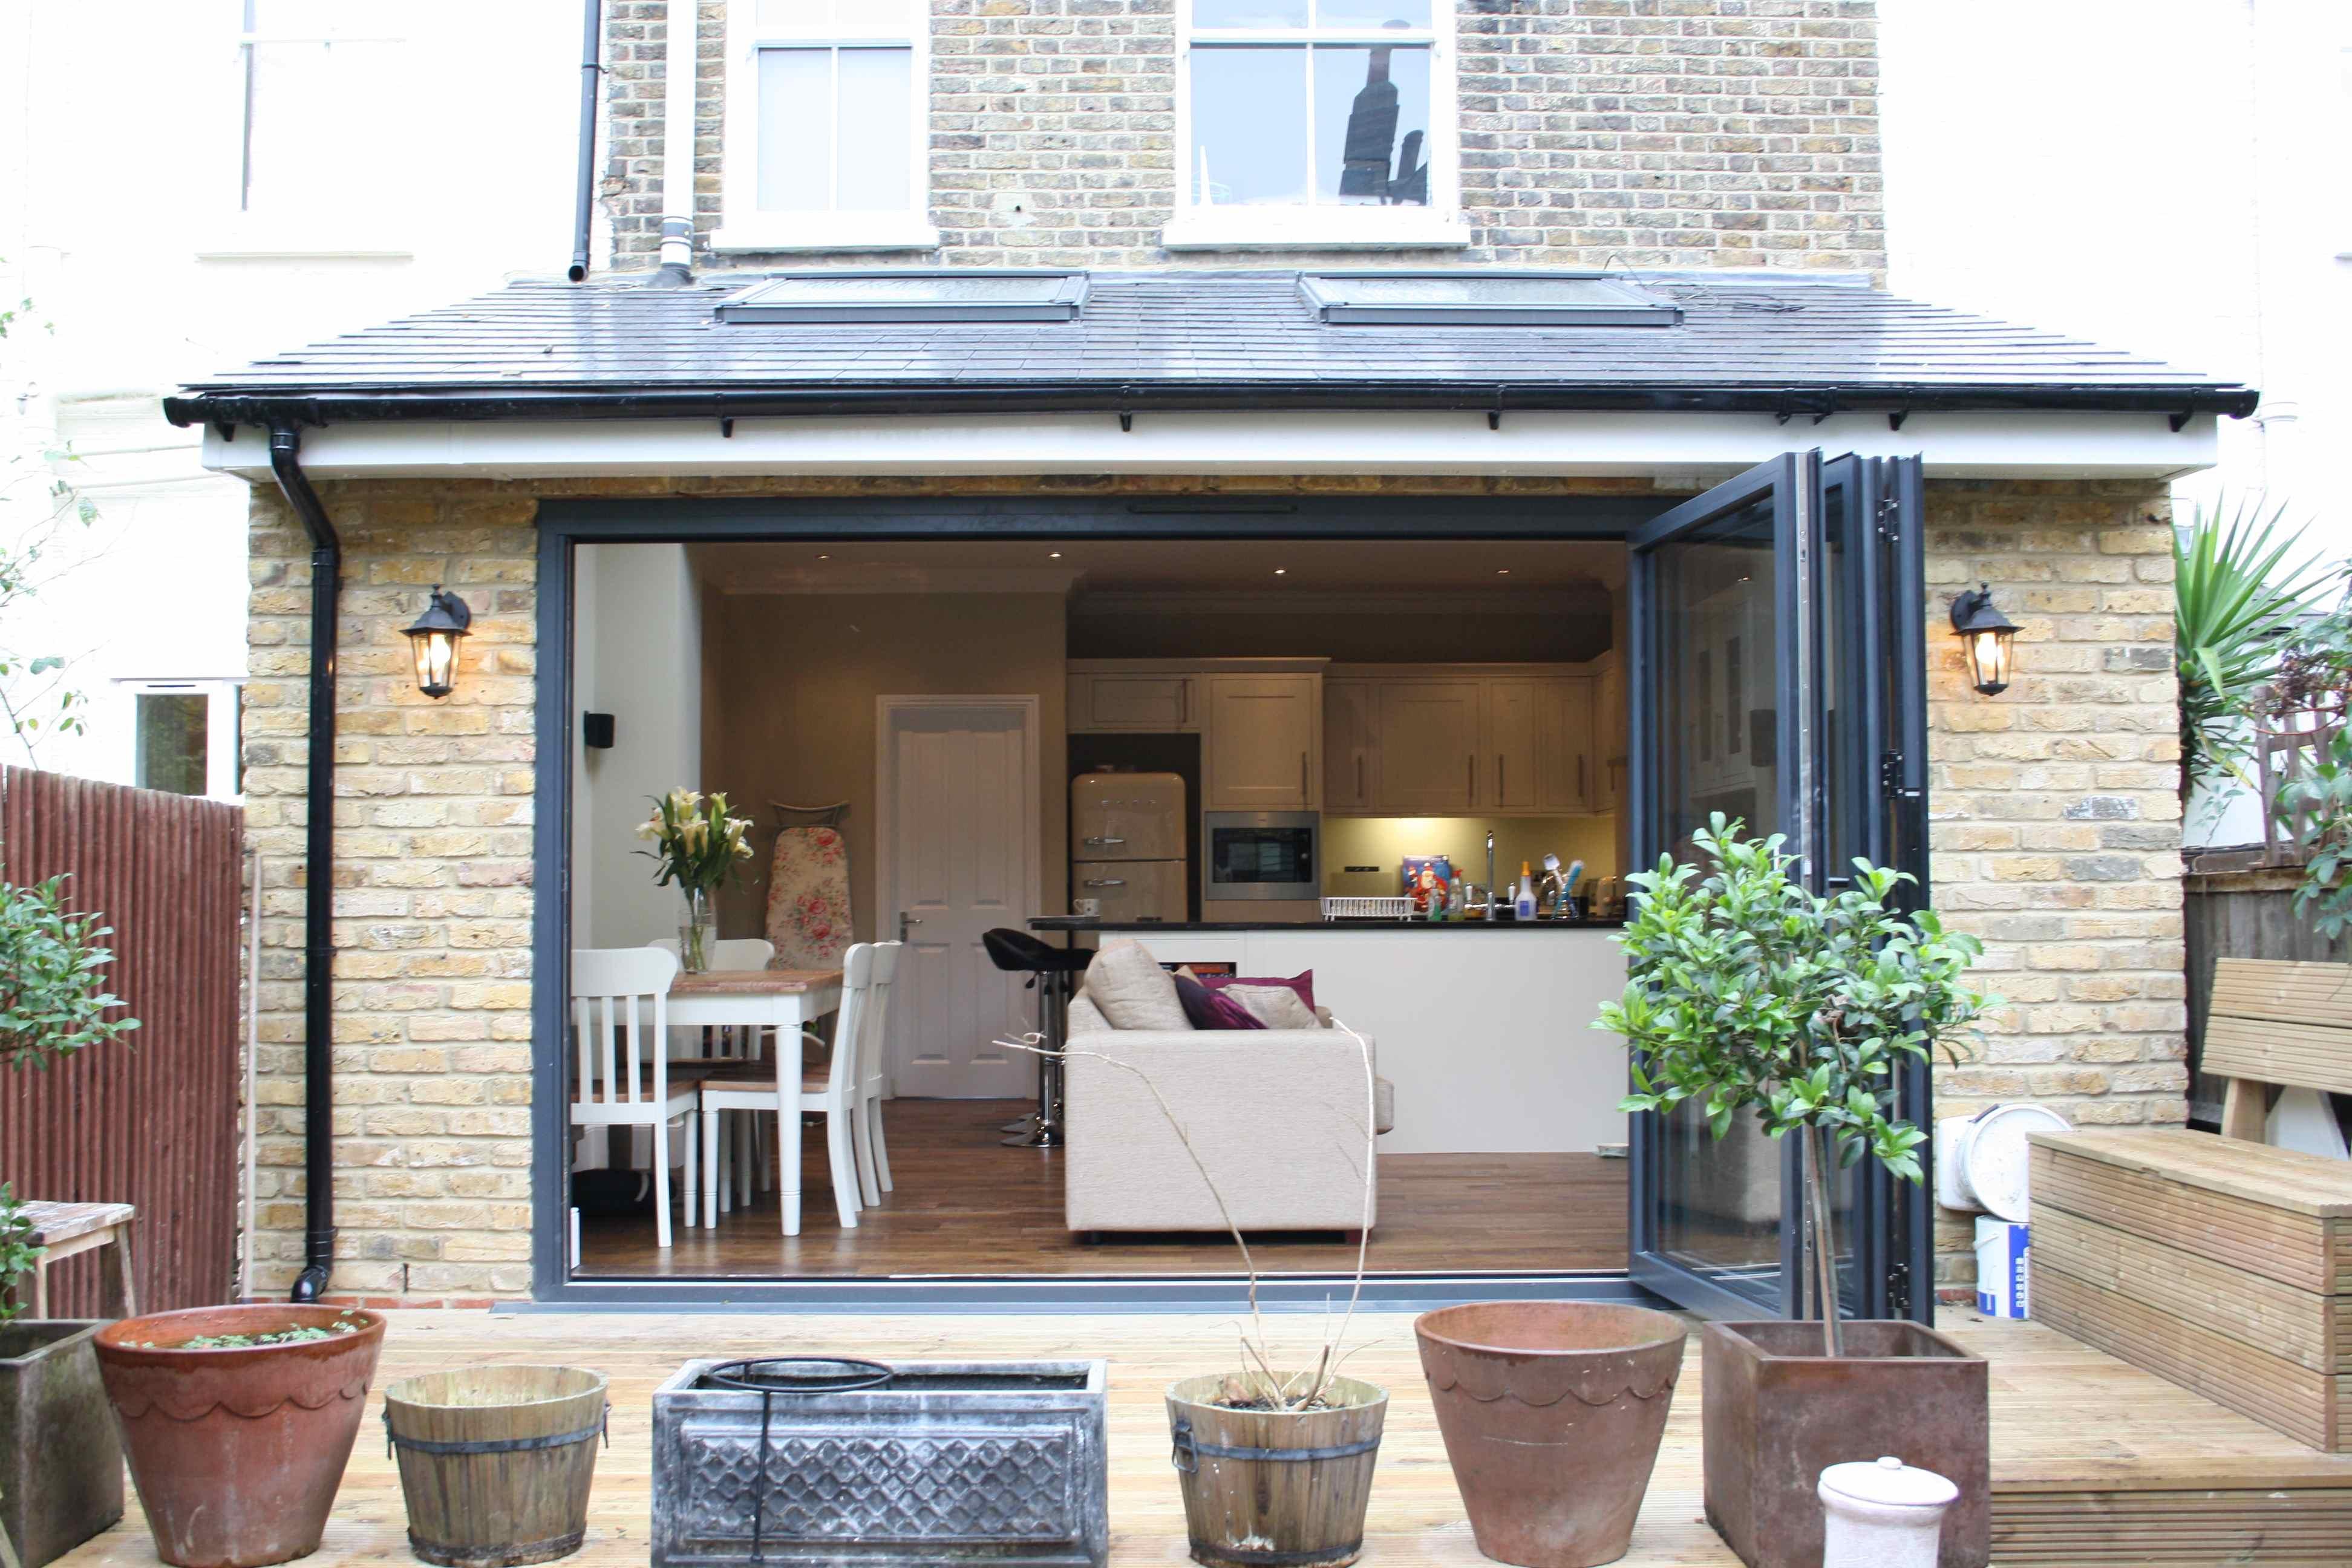 Kitchen Diner Designs In Houses